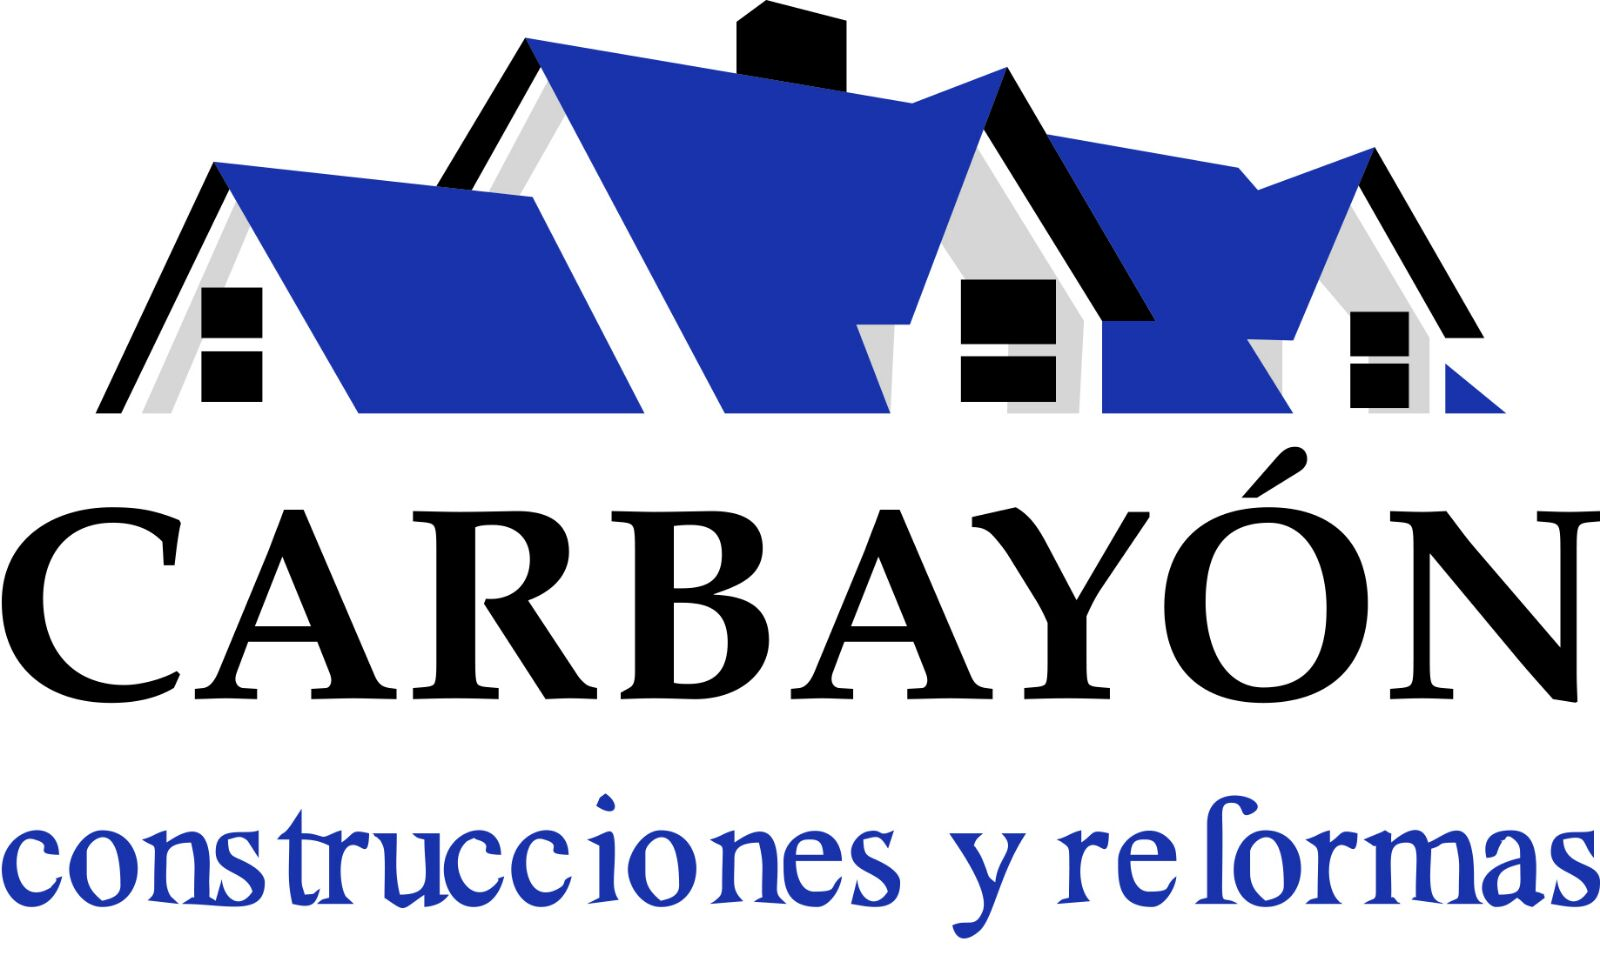 Carbayon